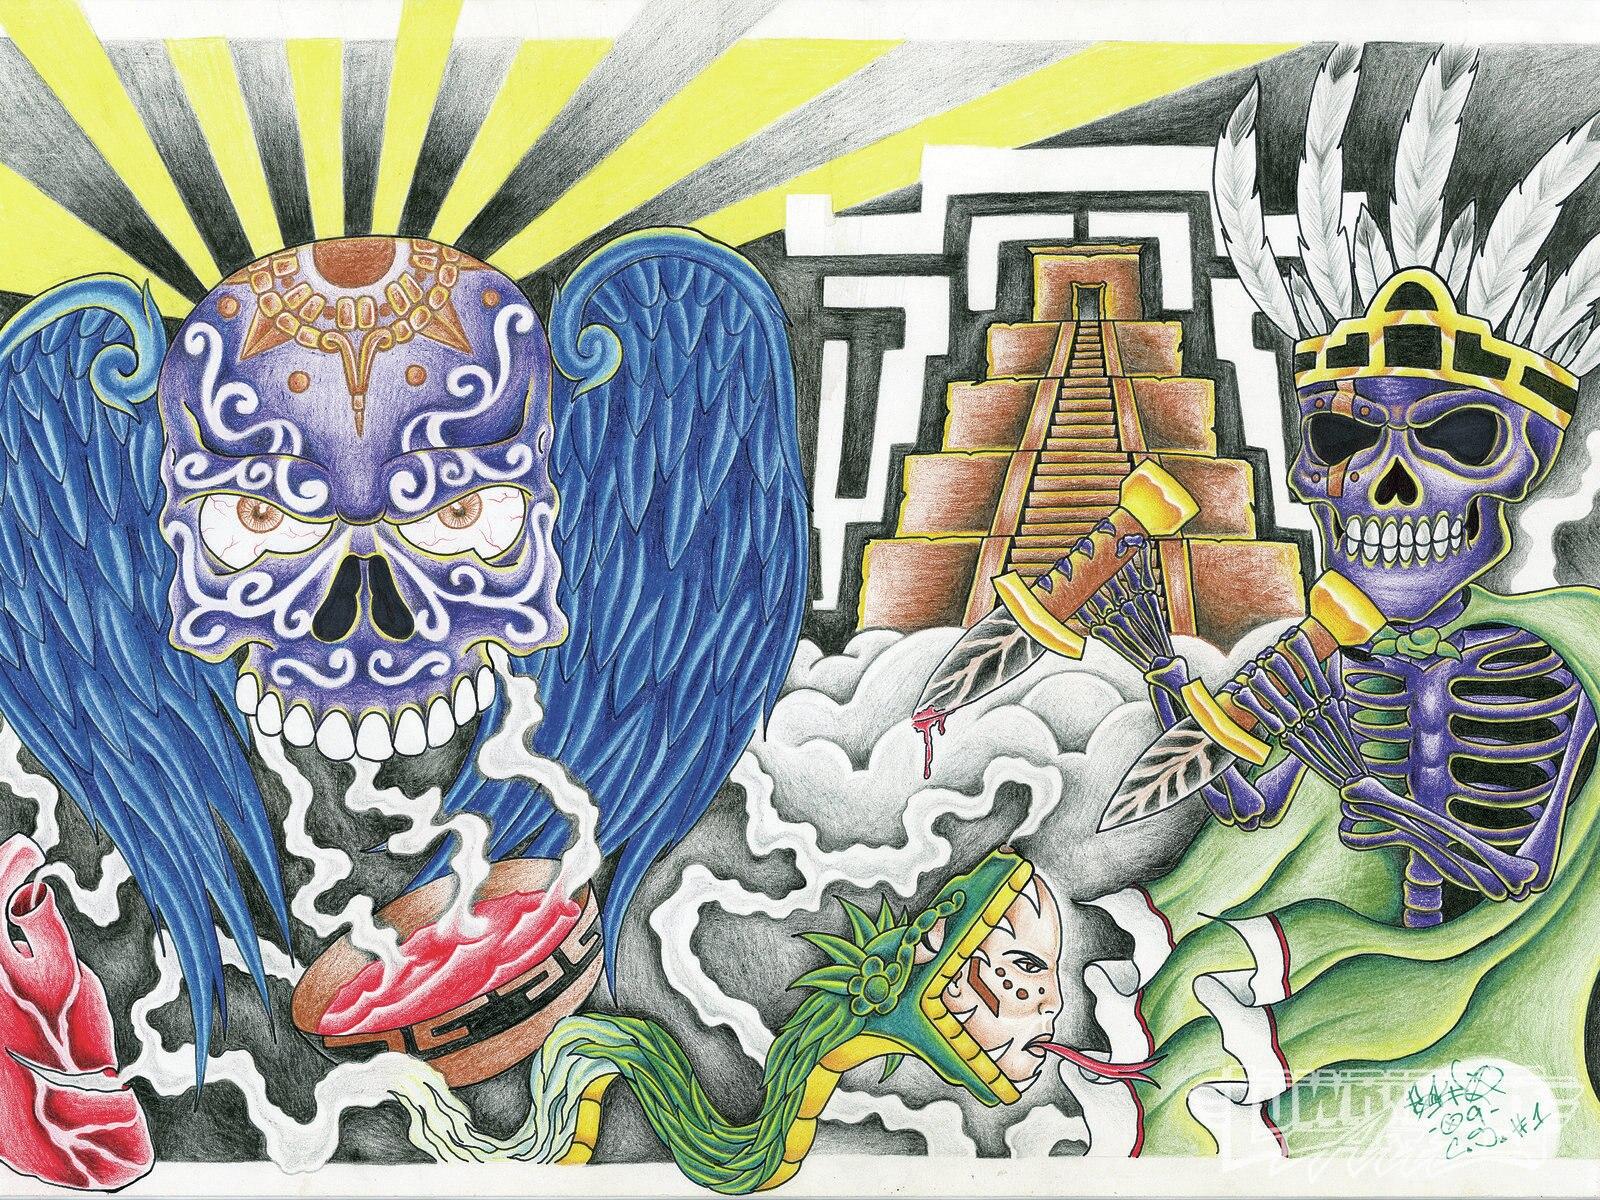 Color art magazine - 5 26